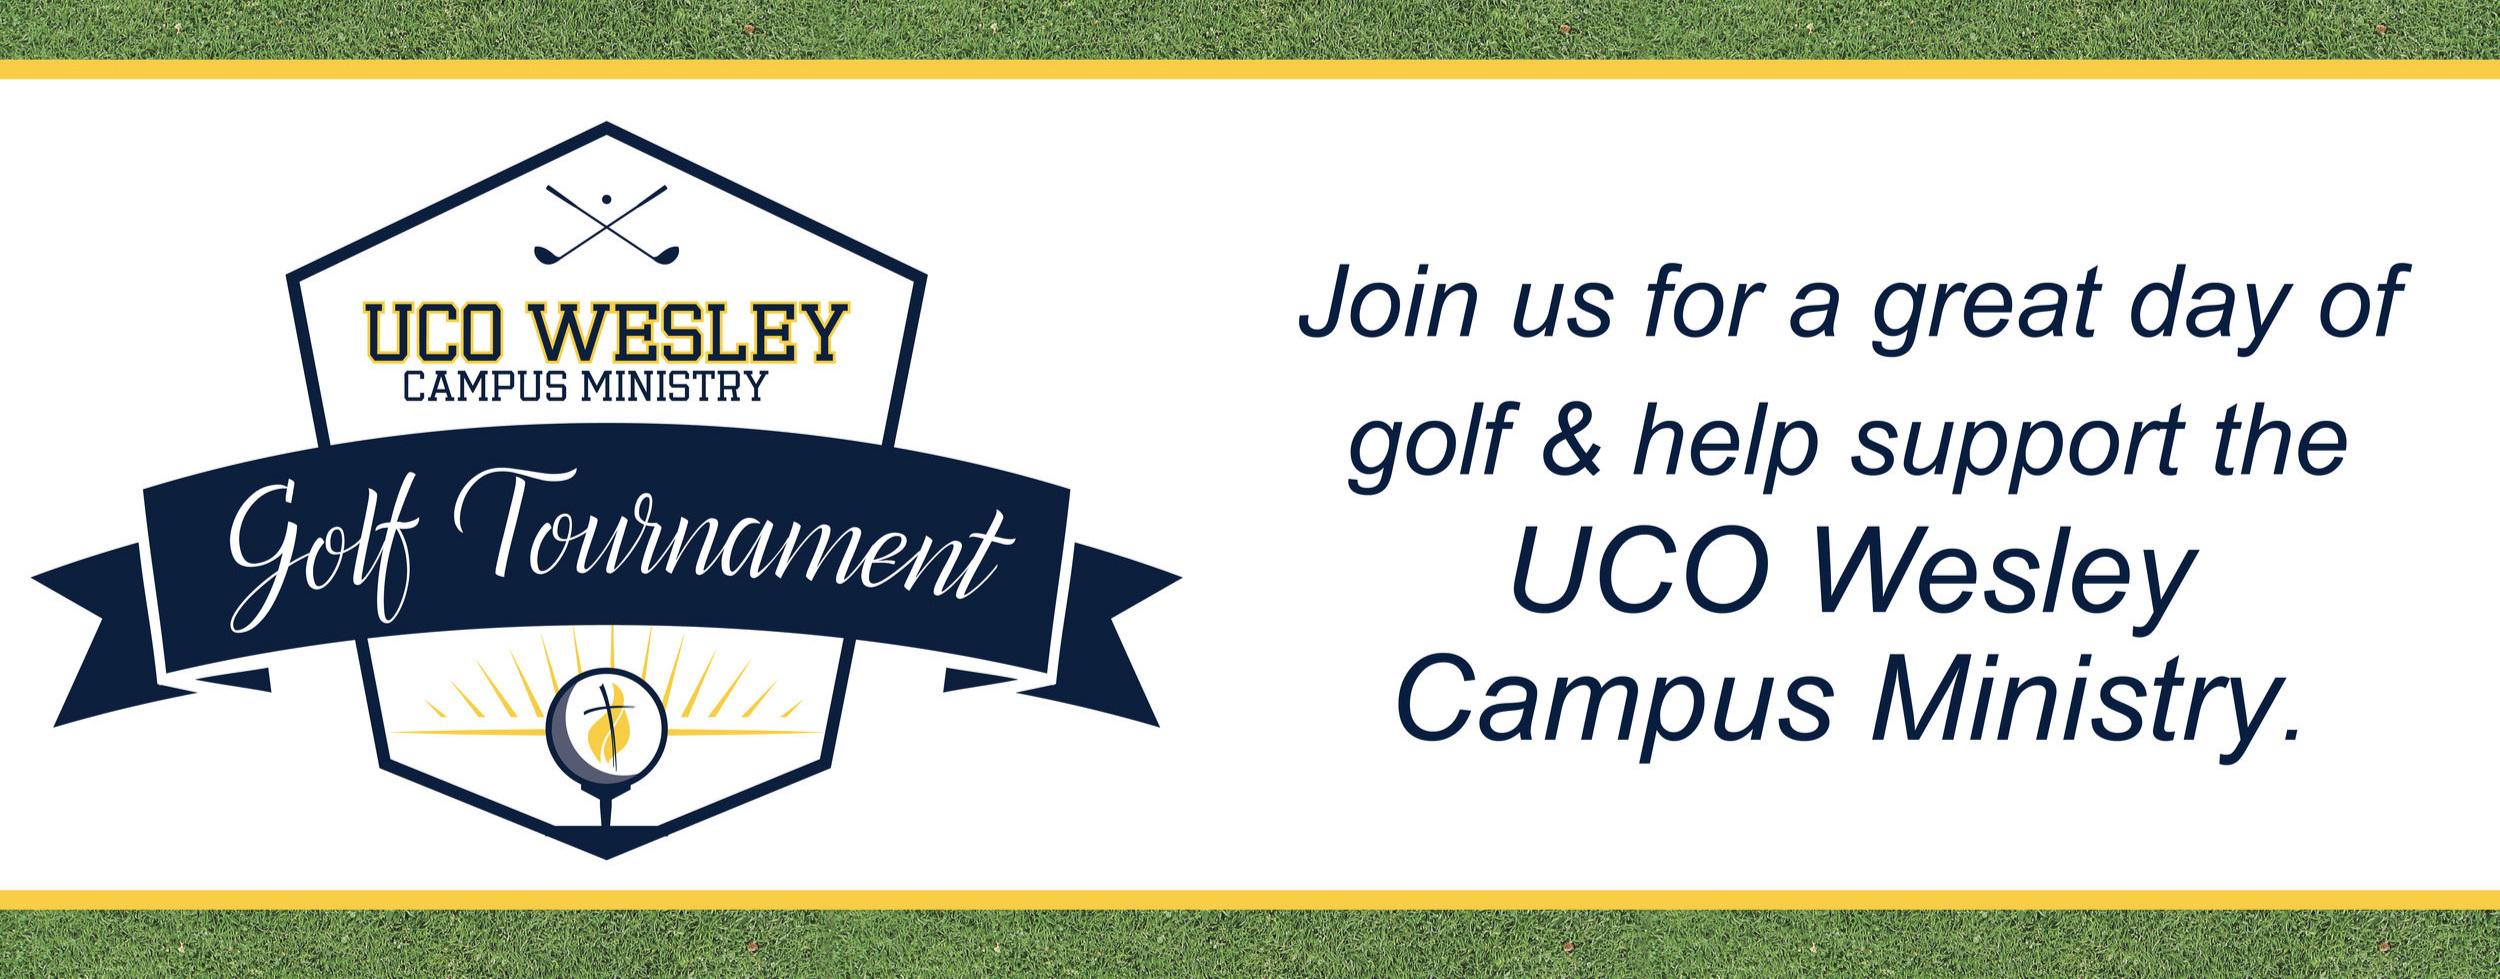 Wesley+Golf+Tournament+screens+2018.jpg